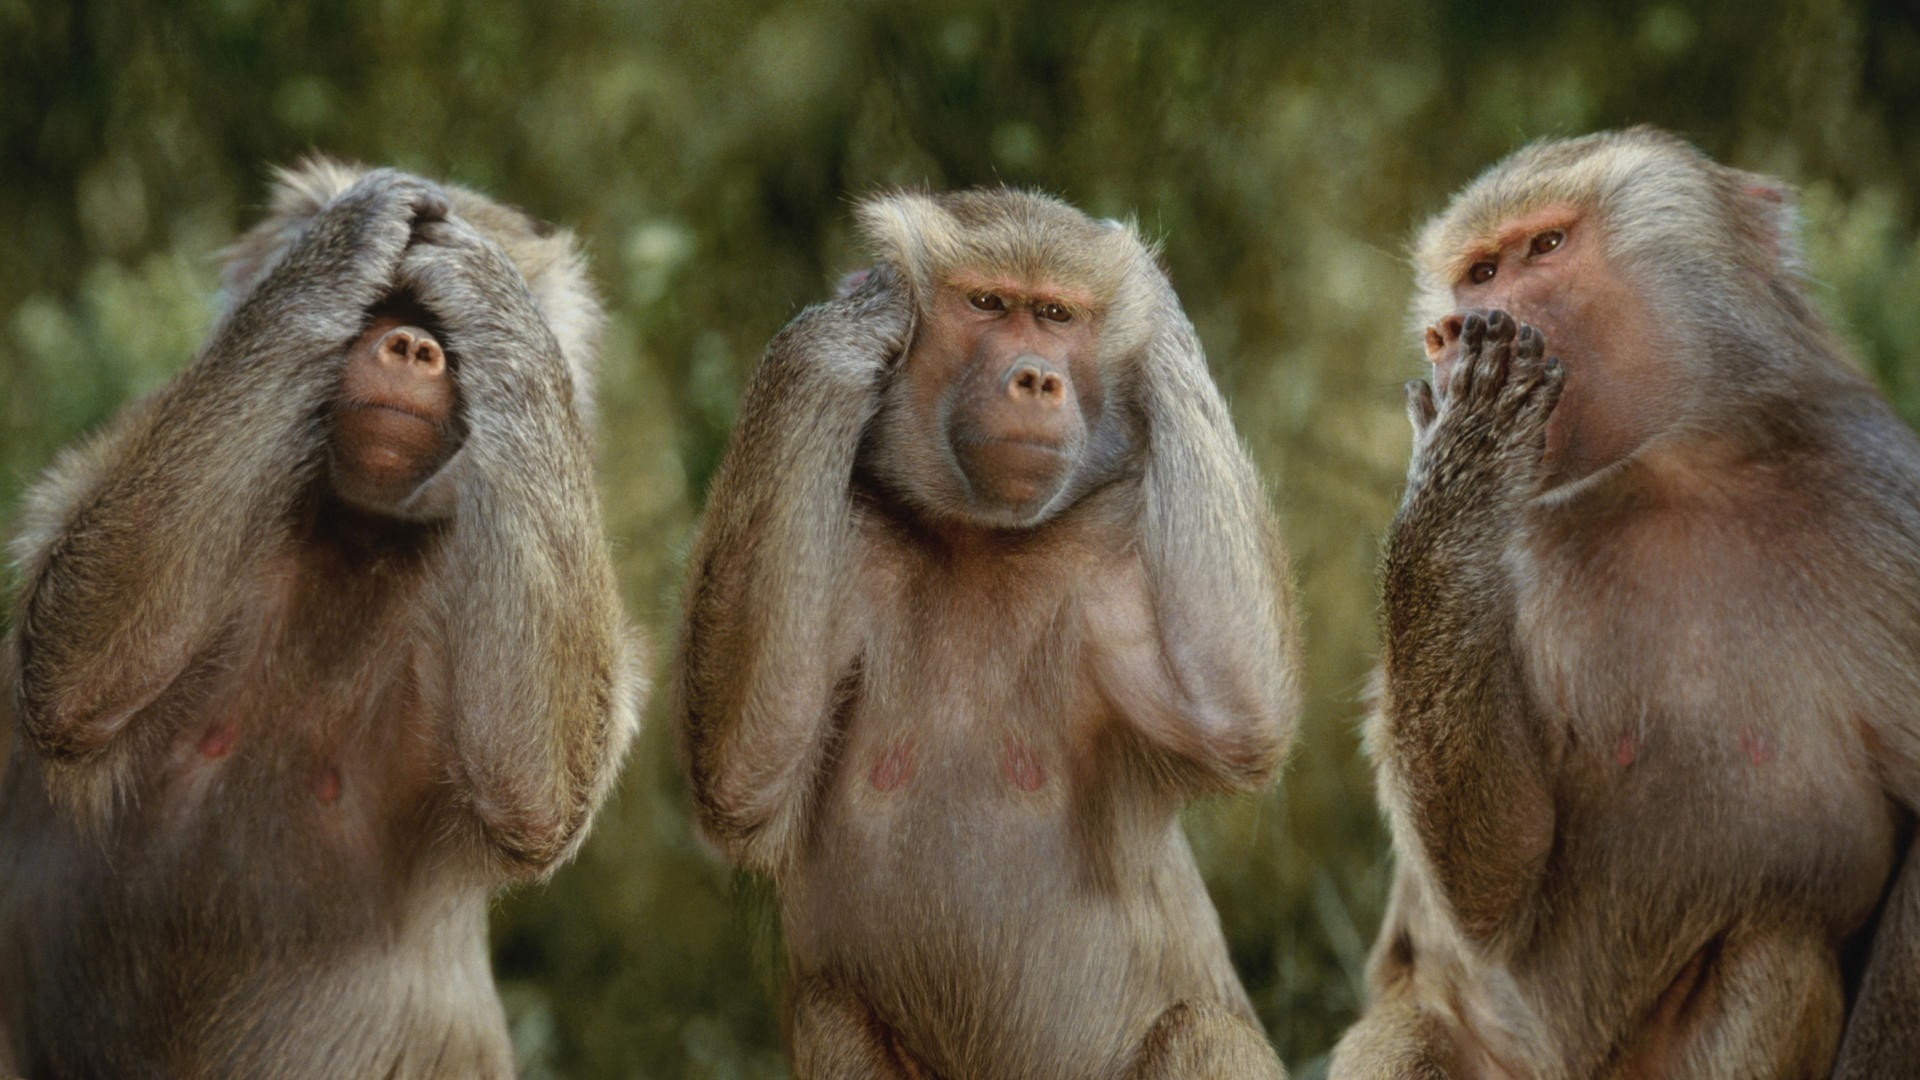 Animal Monkey Wallpaper